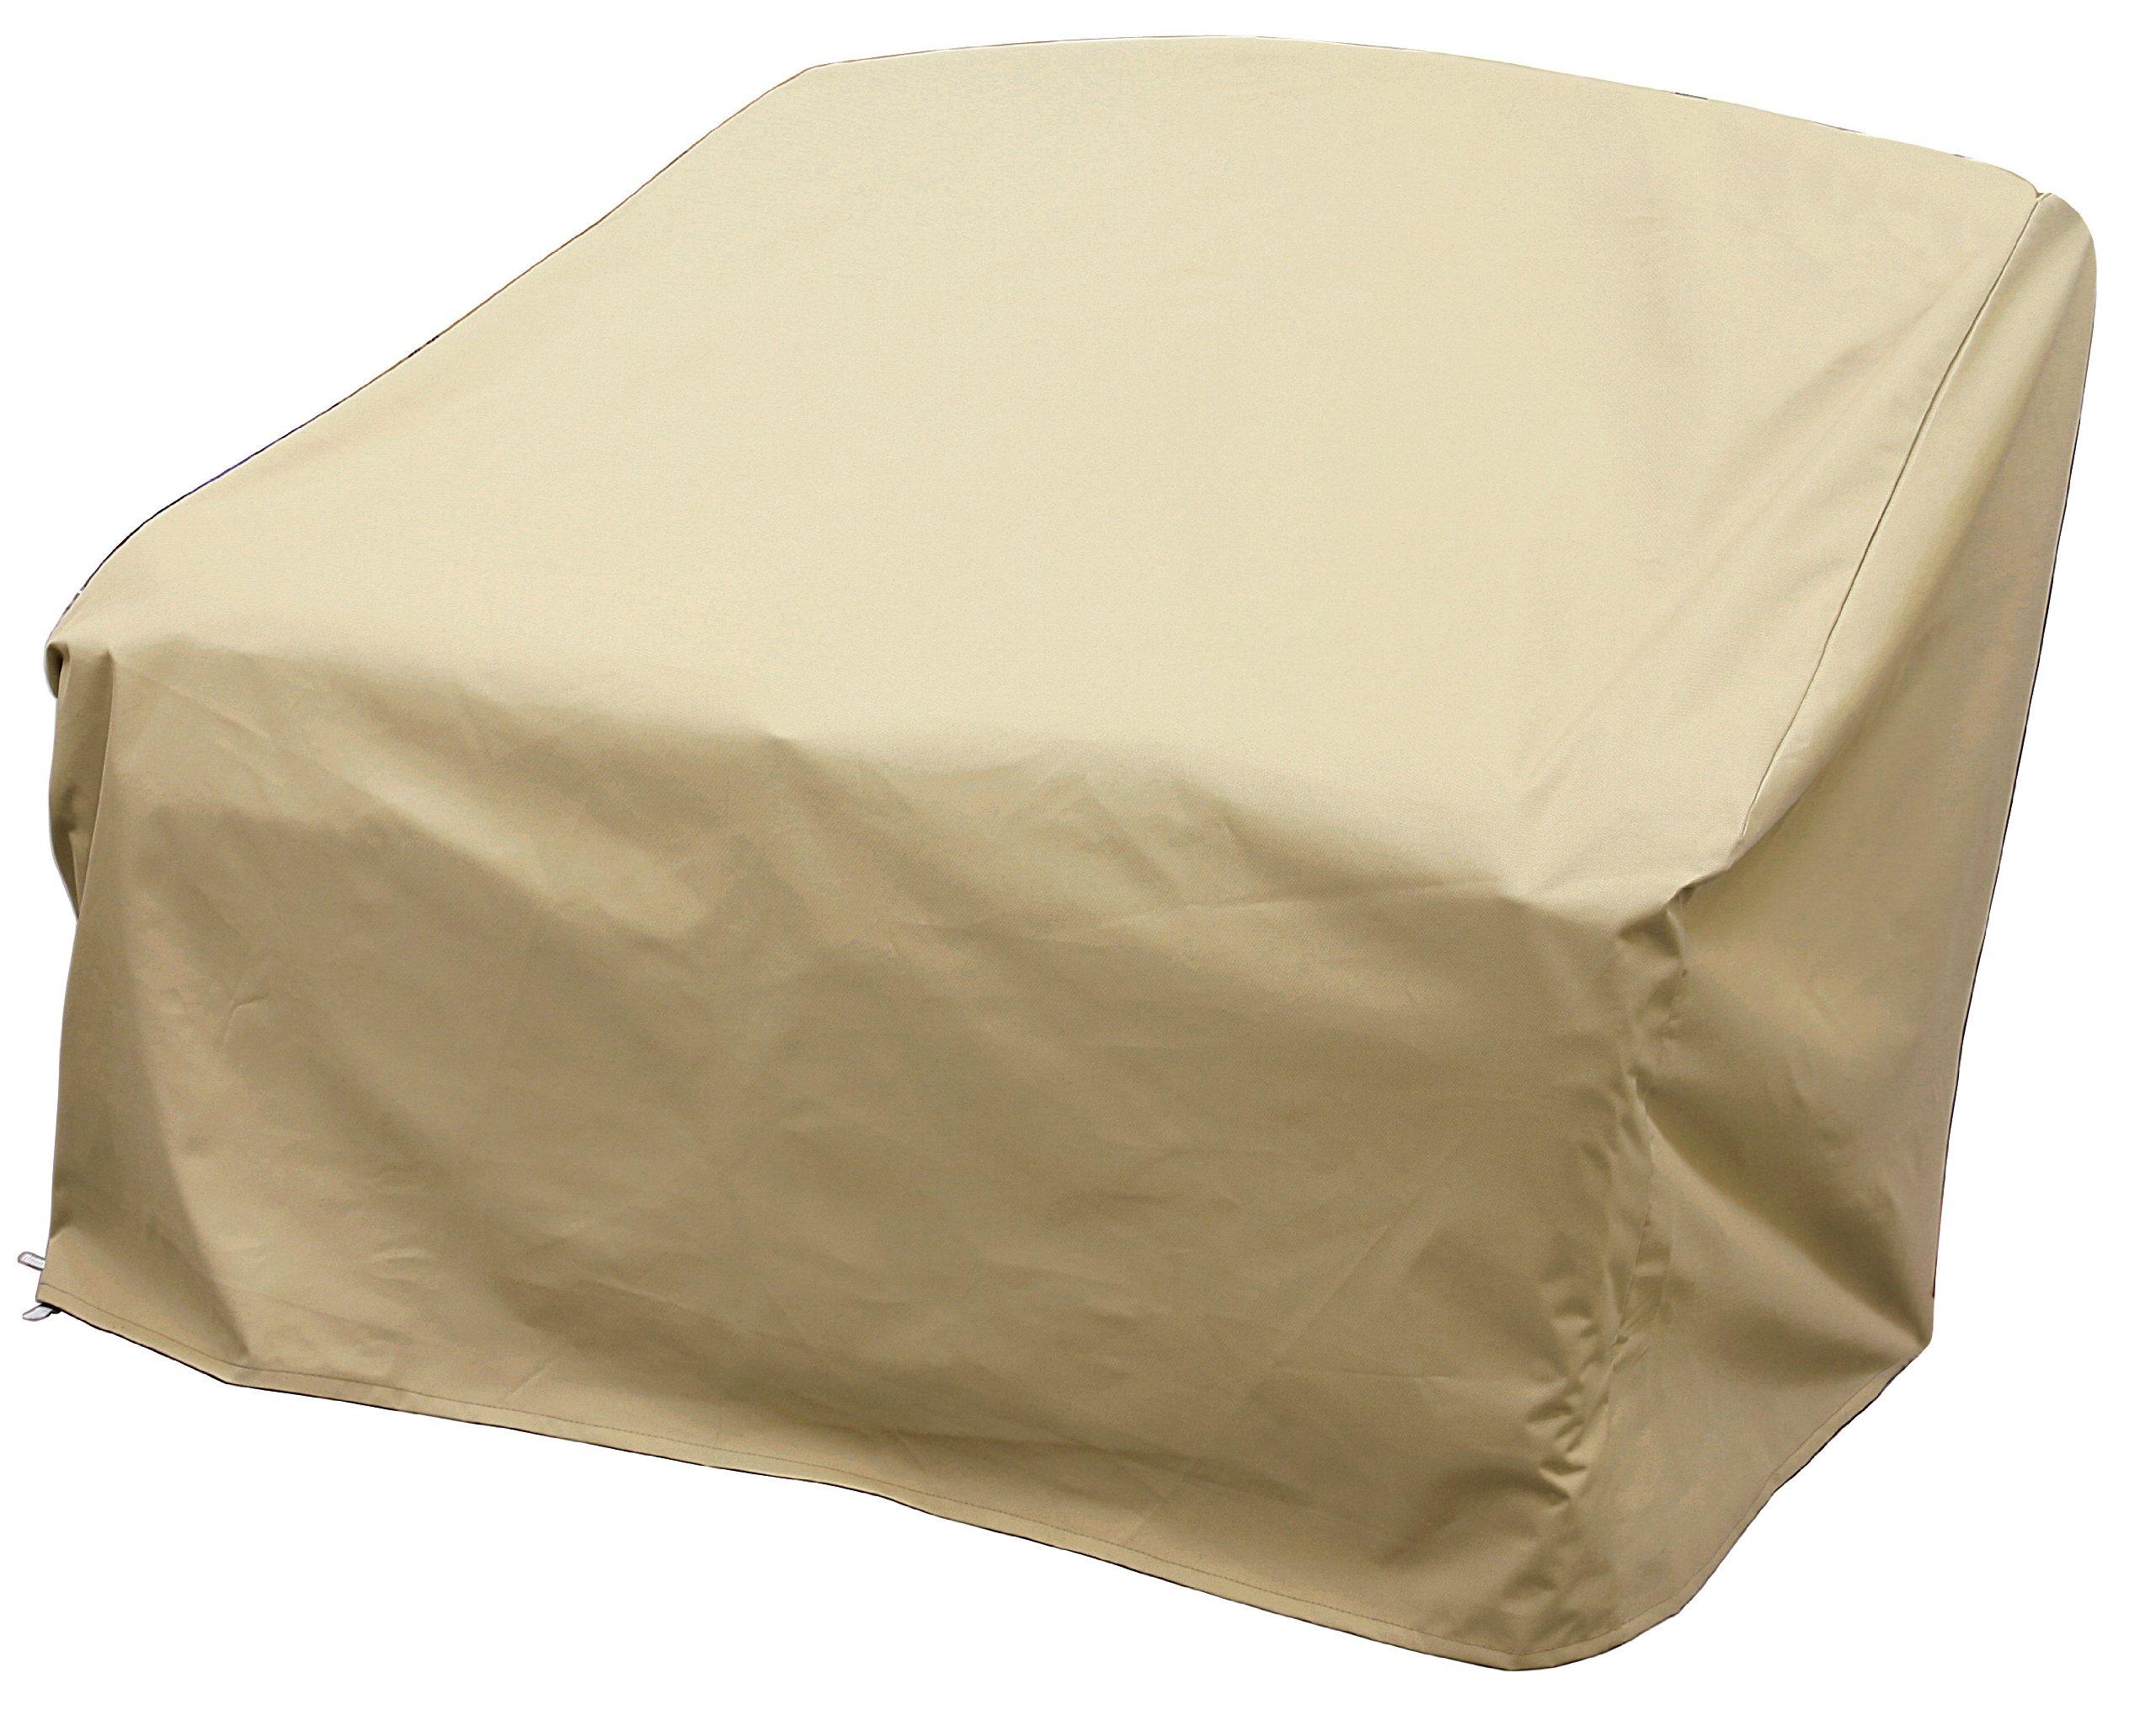 Allen Company Modern Leisure Outdoor Patio Furniture, Love Seat Cover, Waterproof & Weatherproof Love Seat Cover